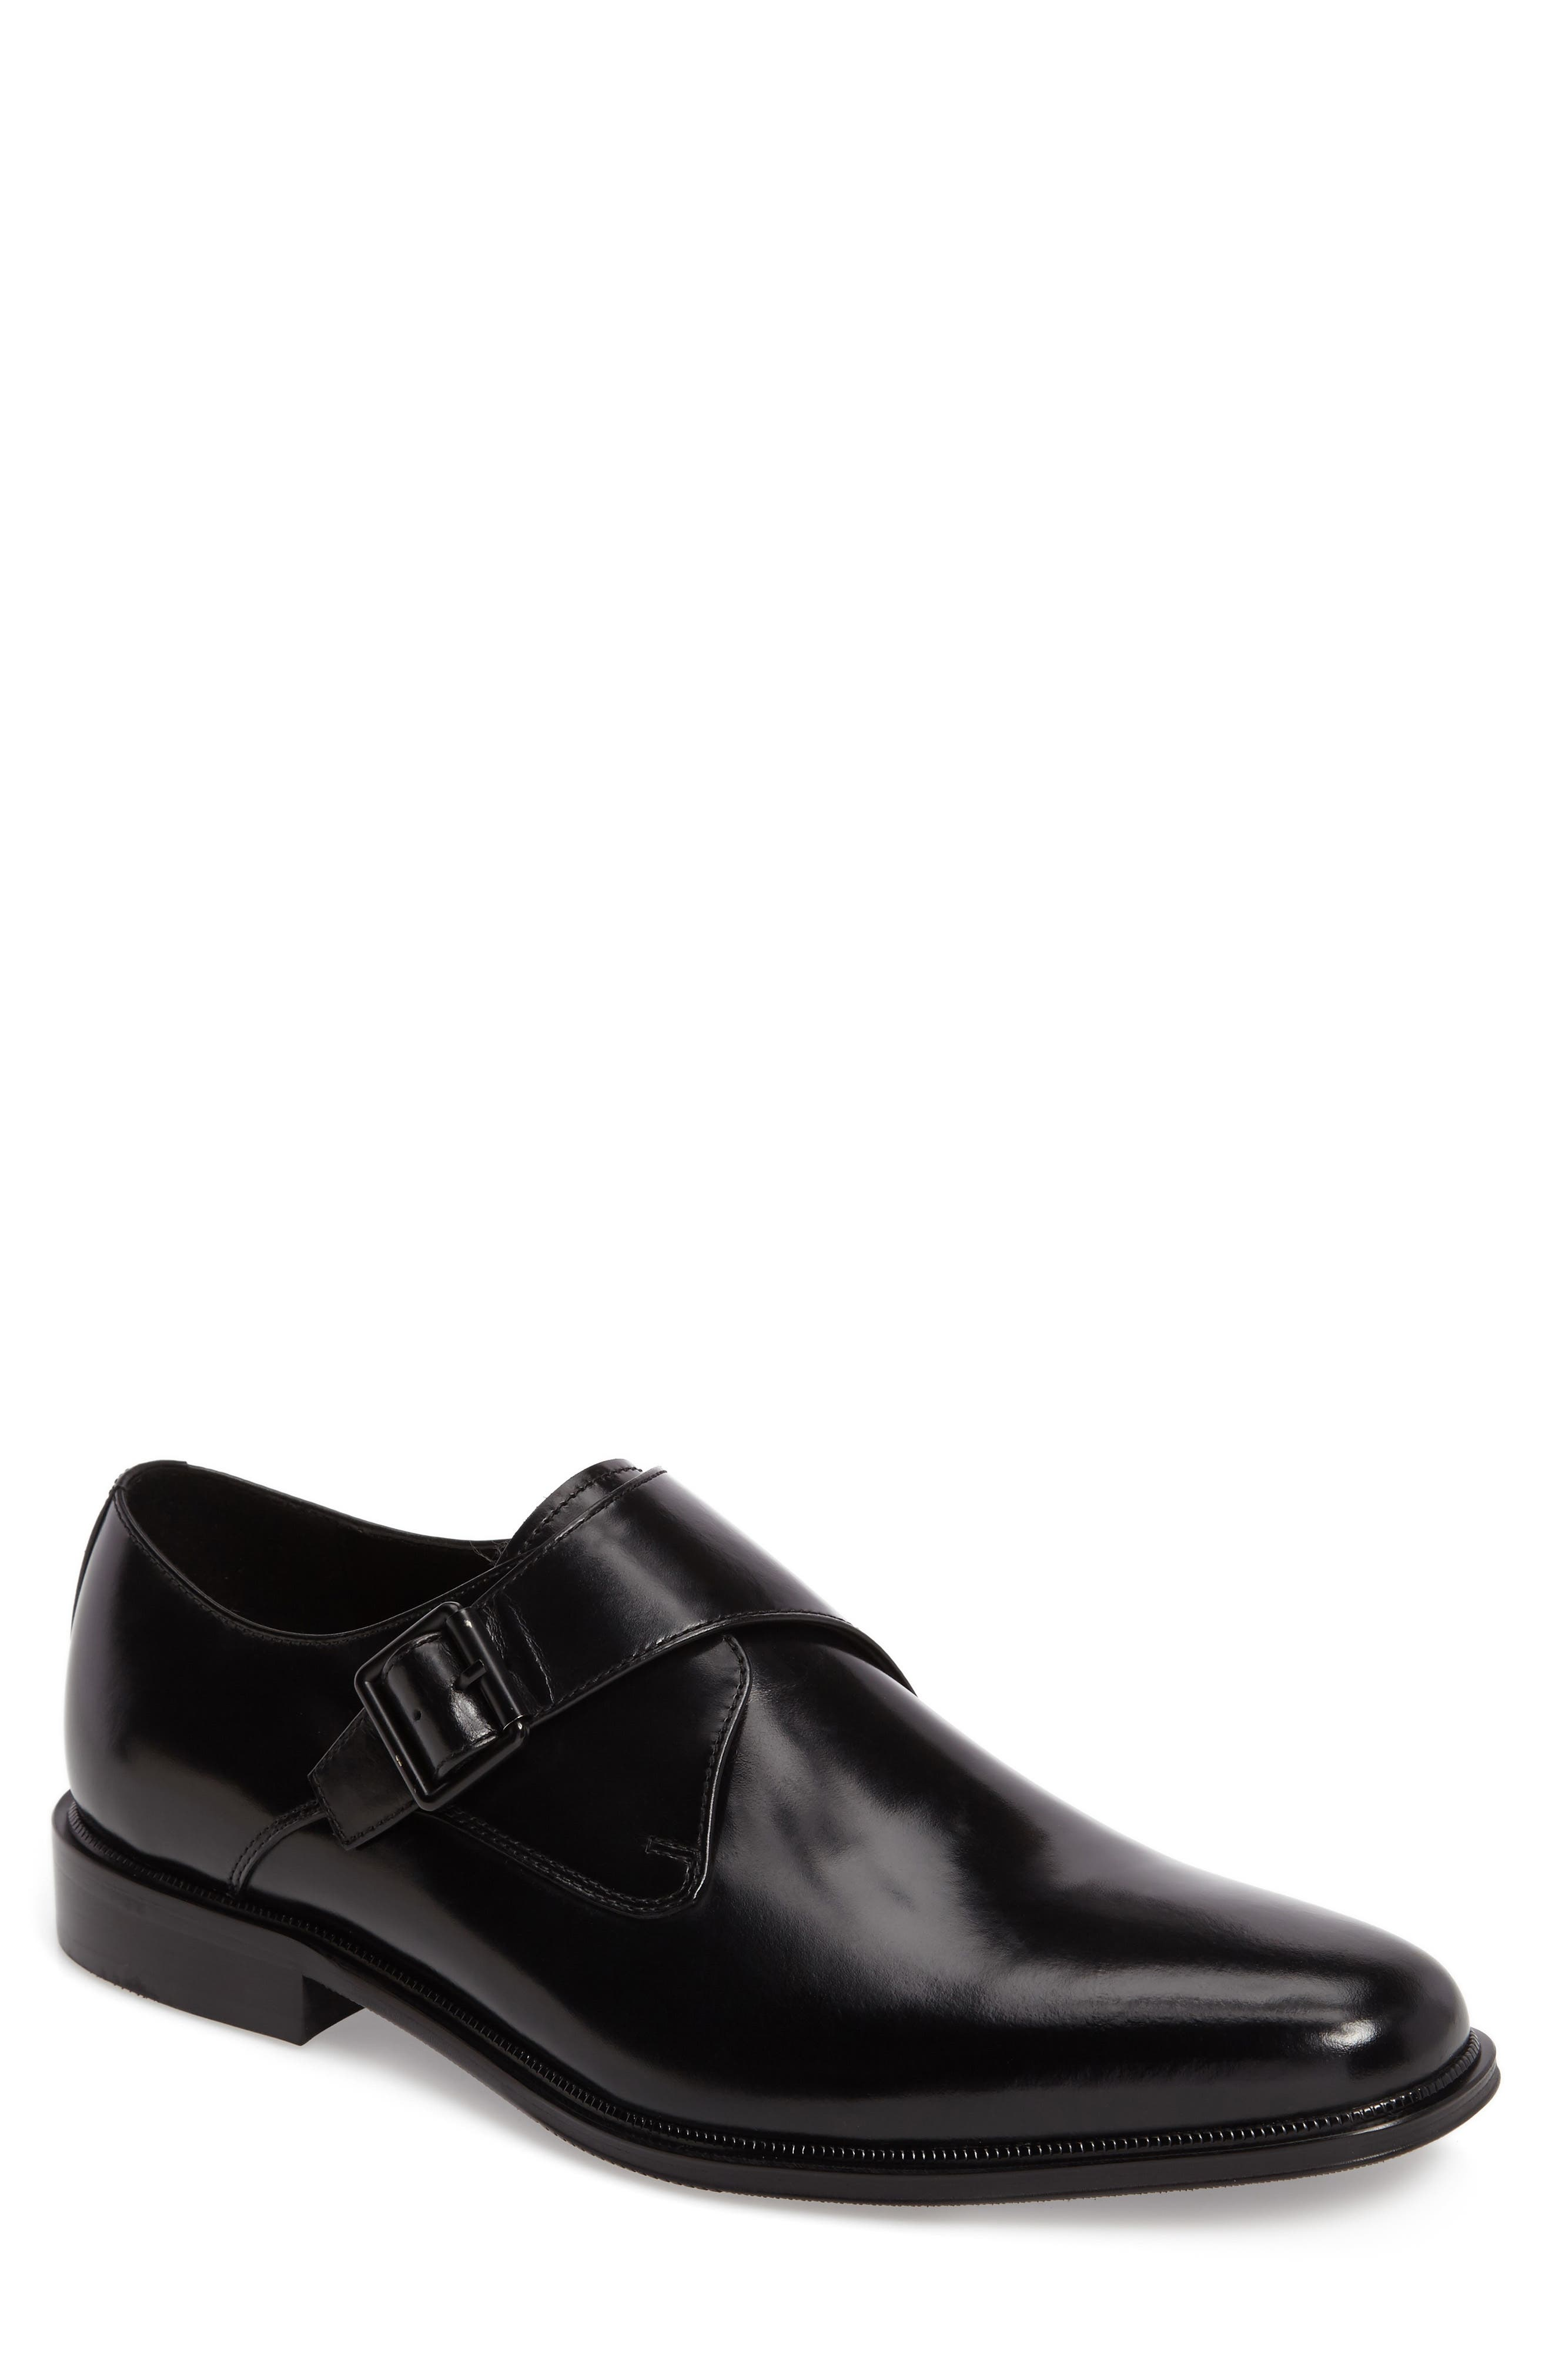 Reaction Kenneth Cole Design 20194 Monk Strap Shoe (Men)